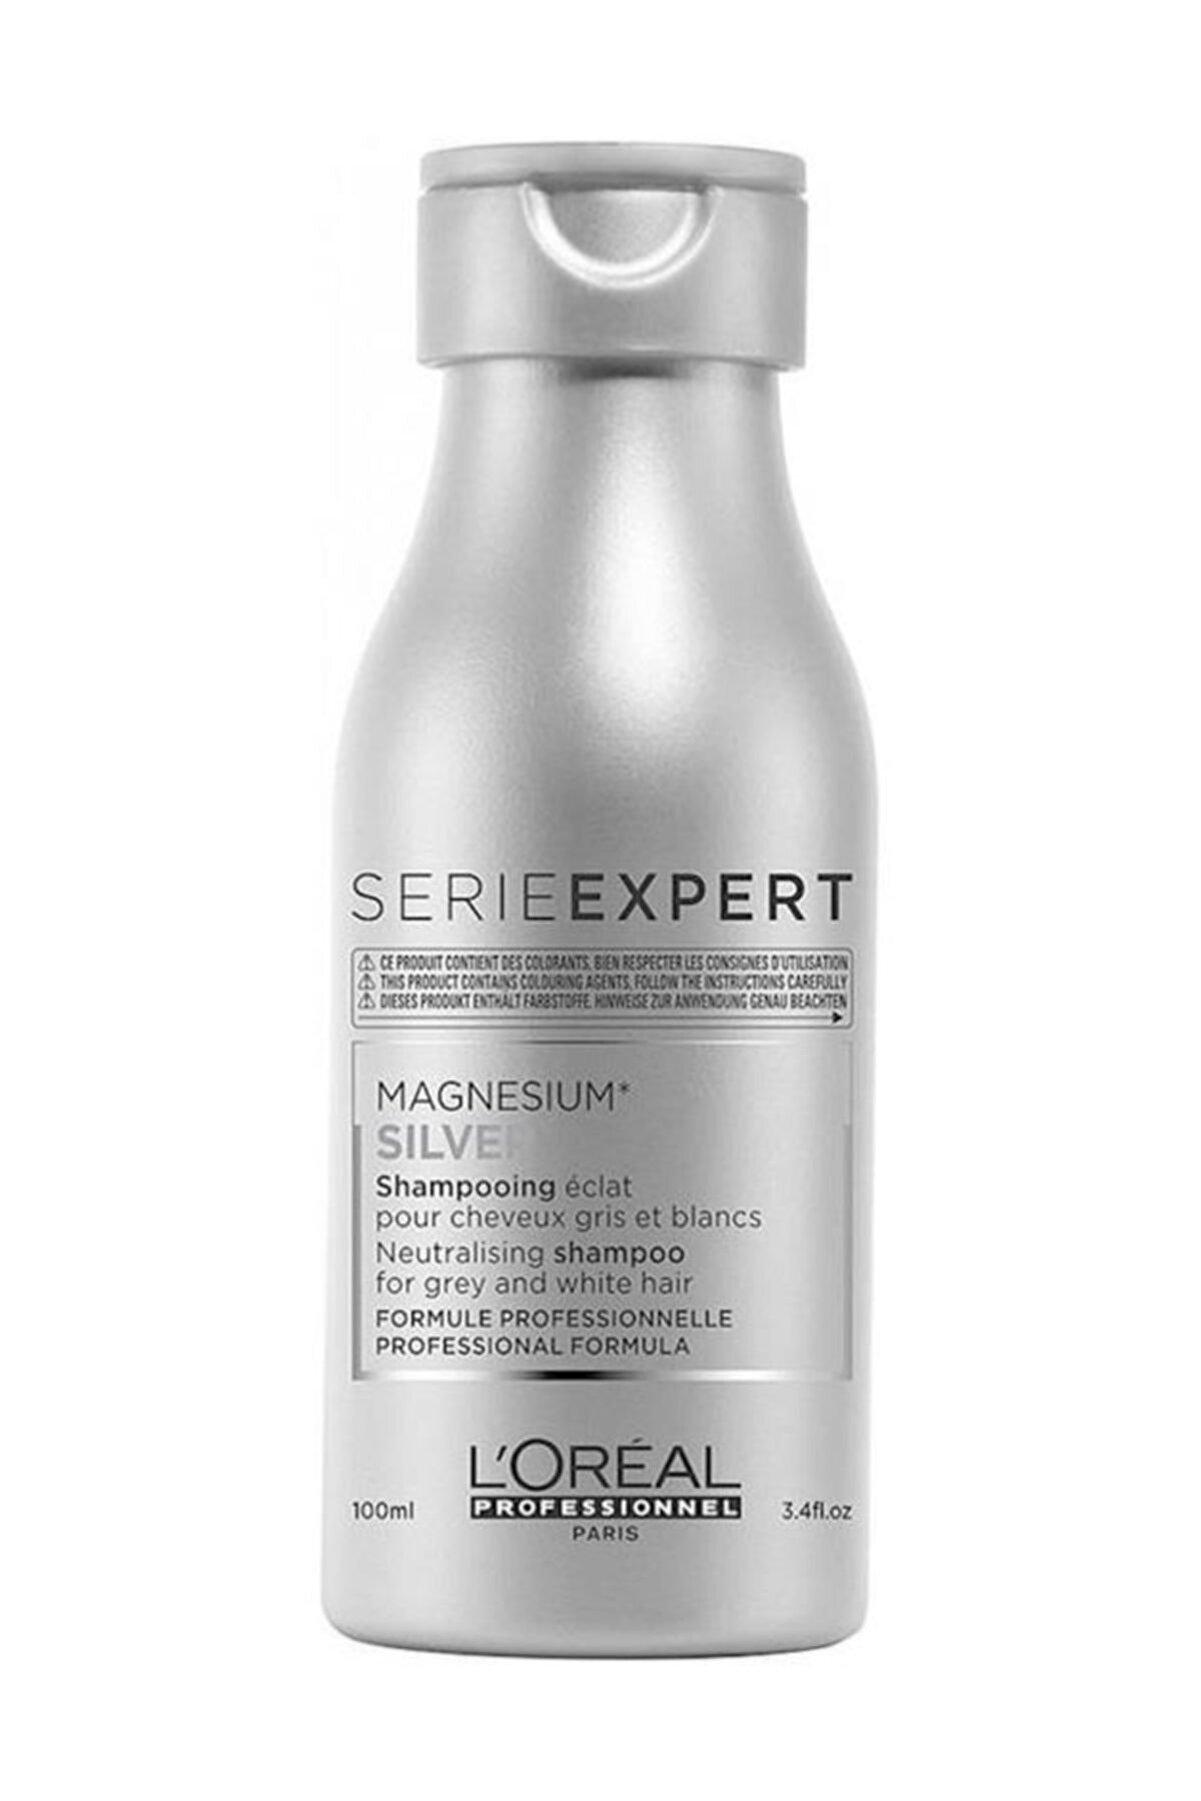 L'oreal Professionnel Magnesium Silver Şampuan 100 ml 3474636569229